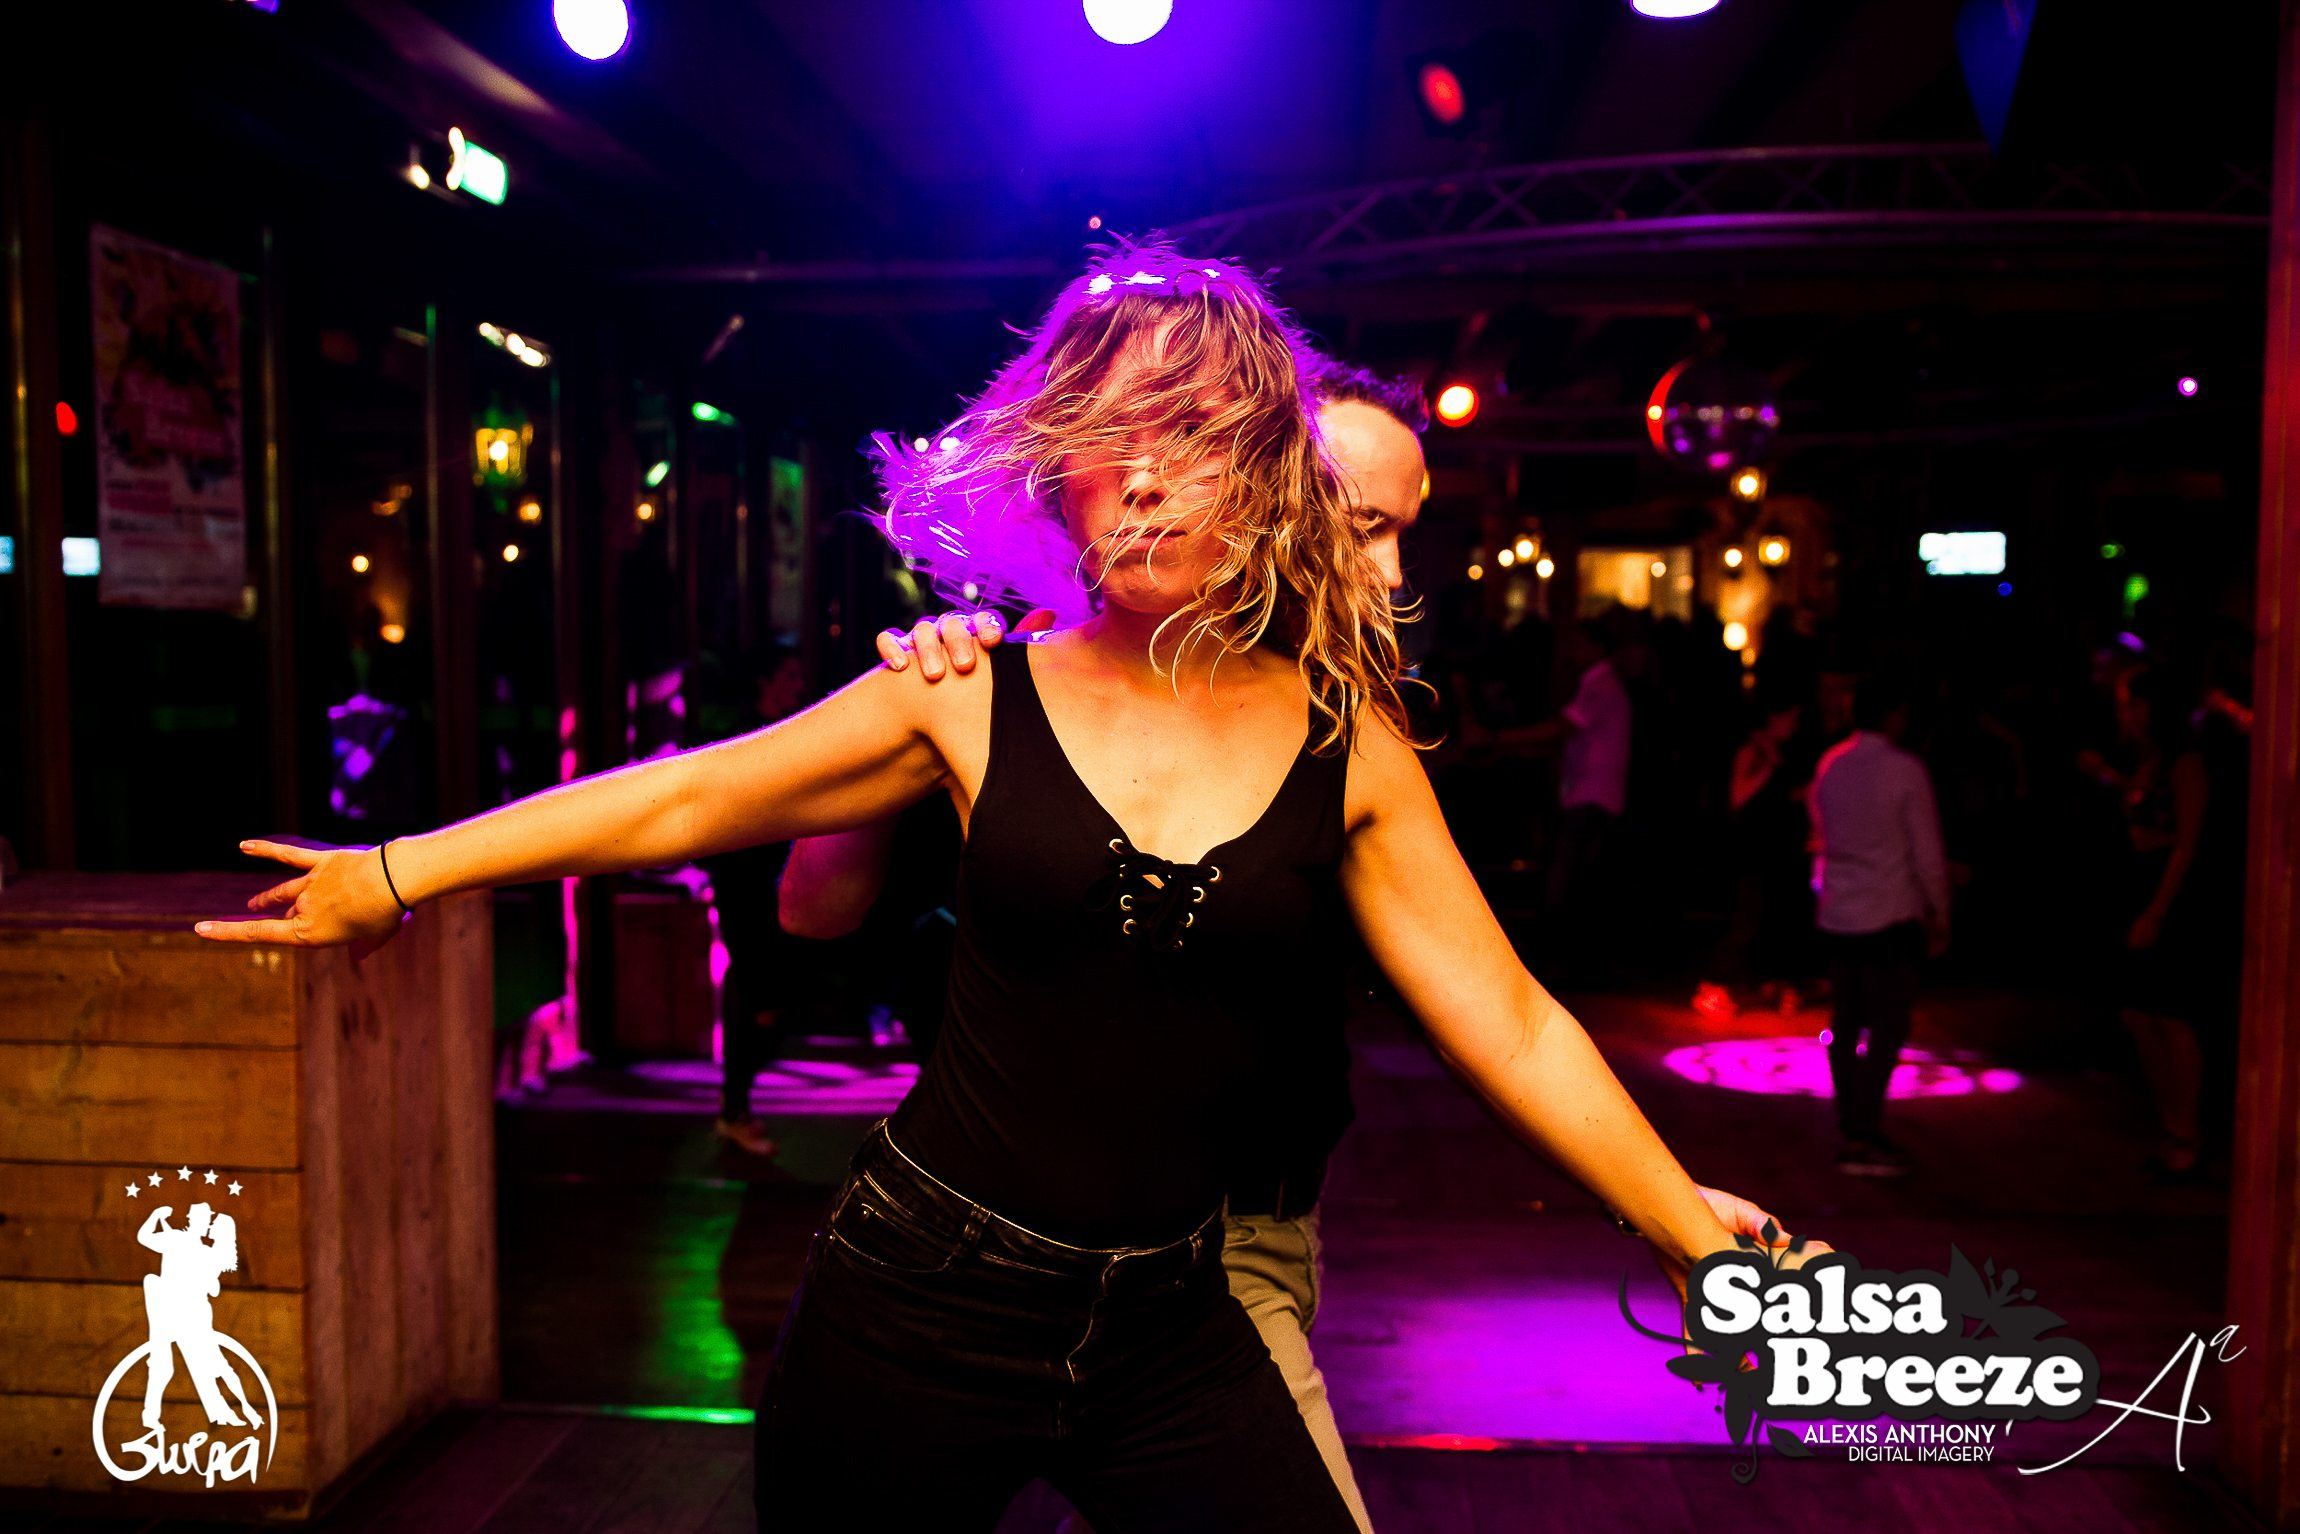 www.SalsaBreeze.nl || photo by Alexis-Anthony.com